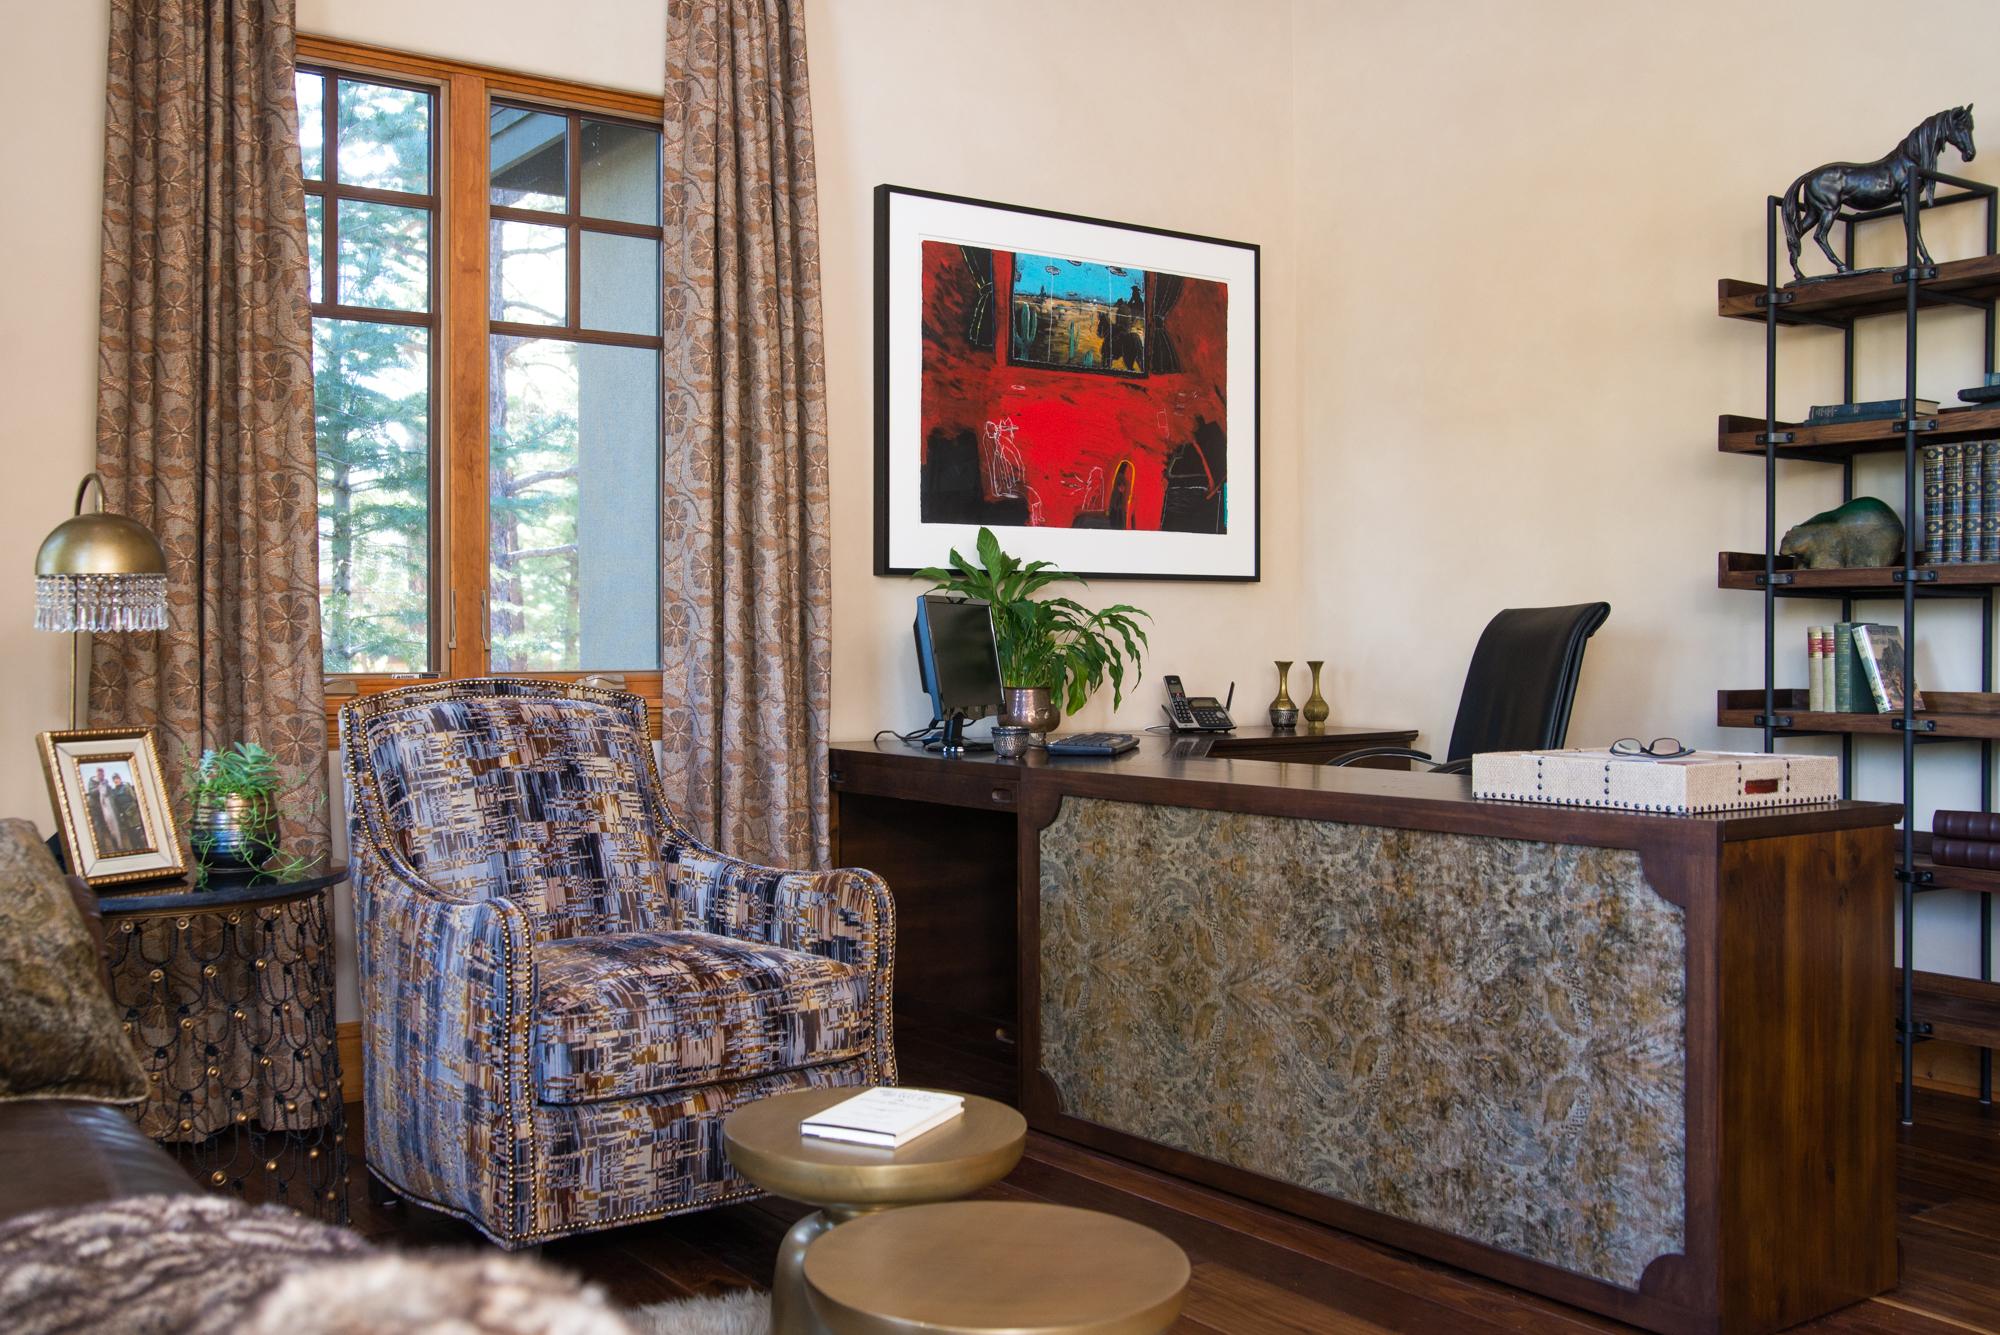 Montreux den fabric selections and interior design - Reno, Nevada - Kovac Design